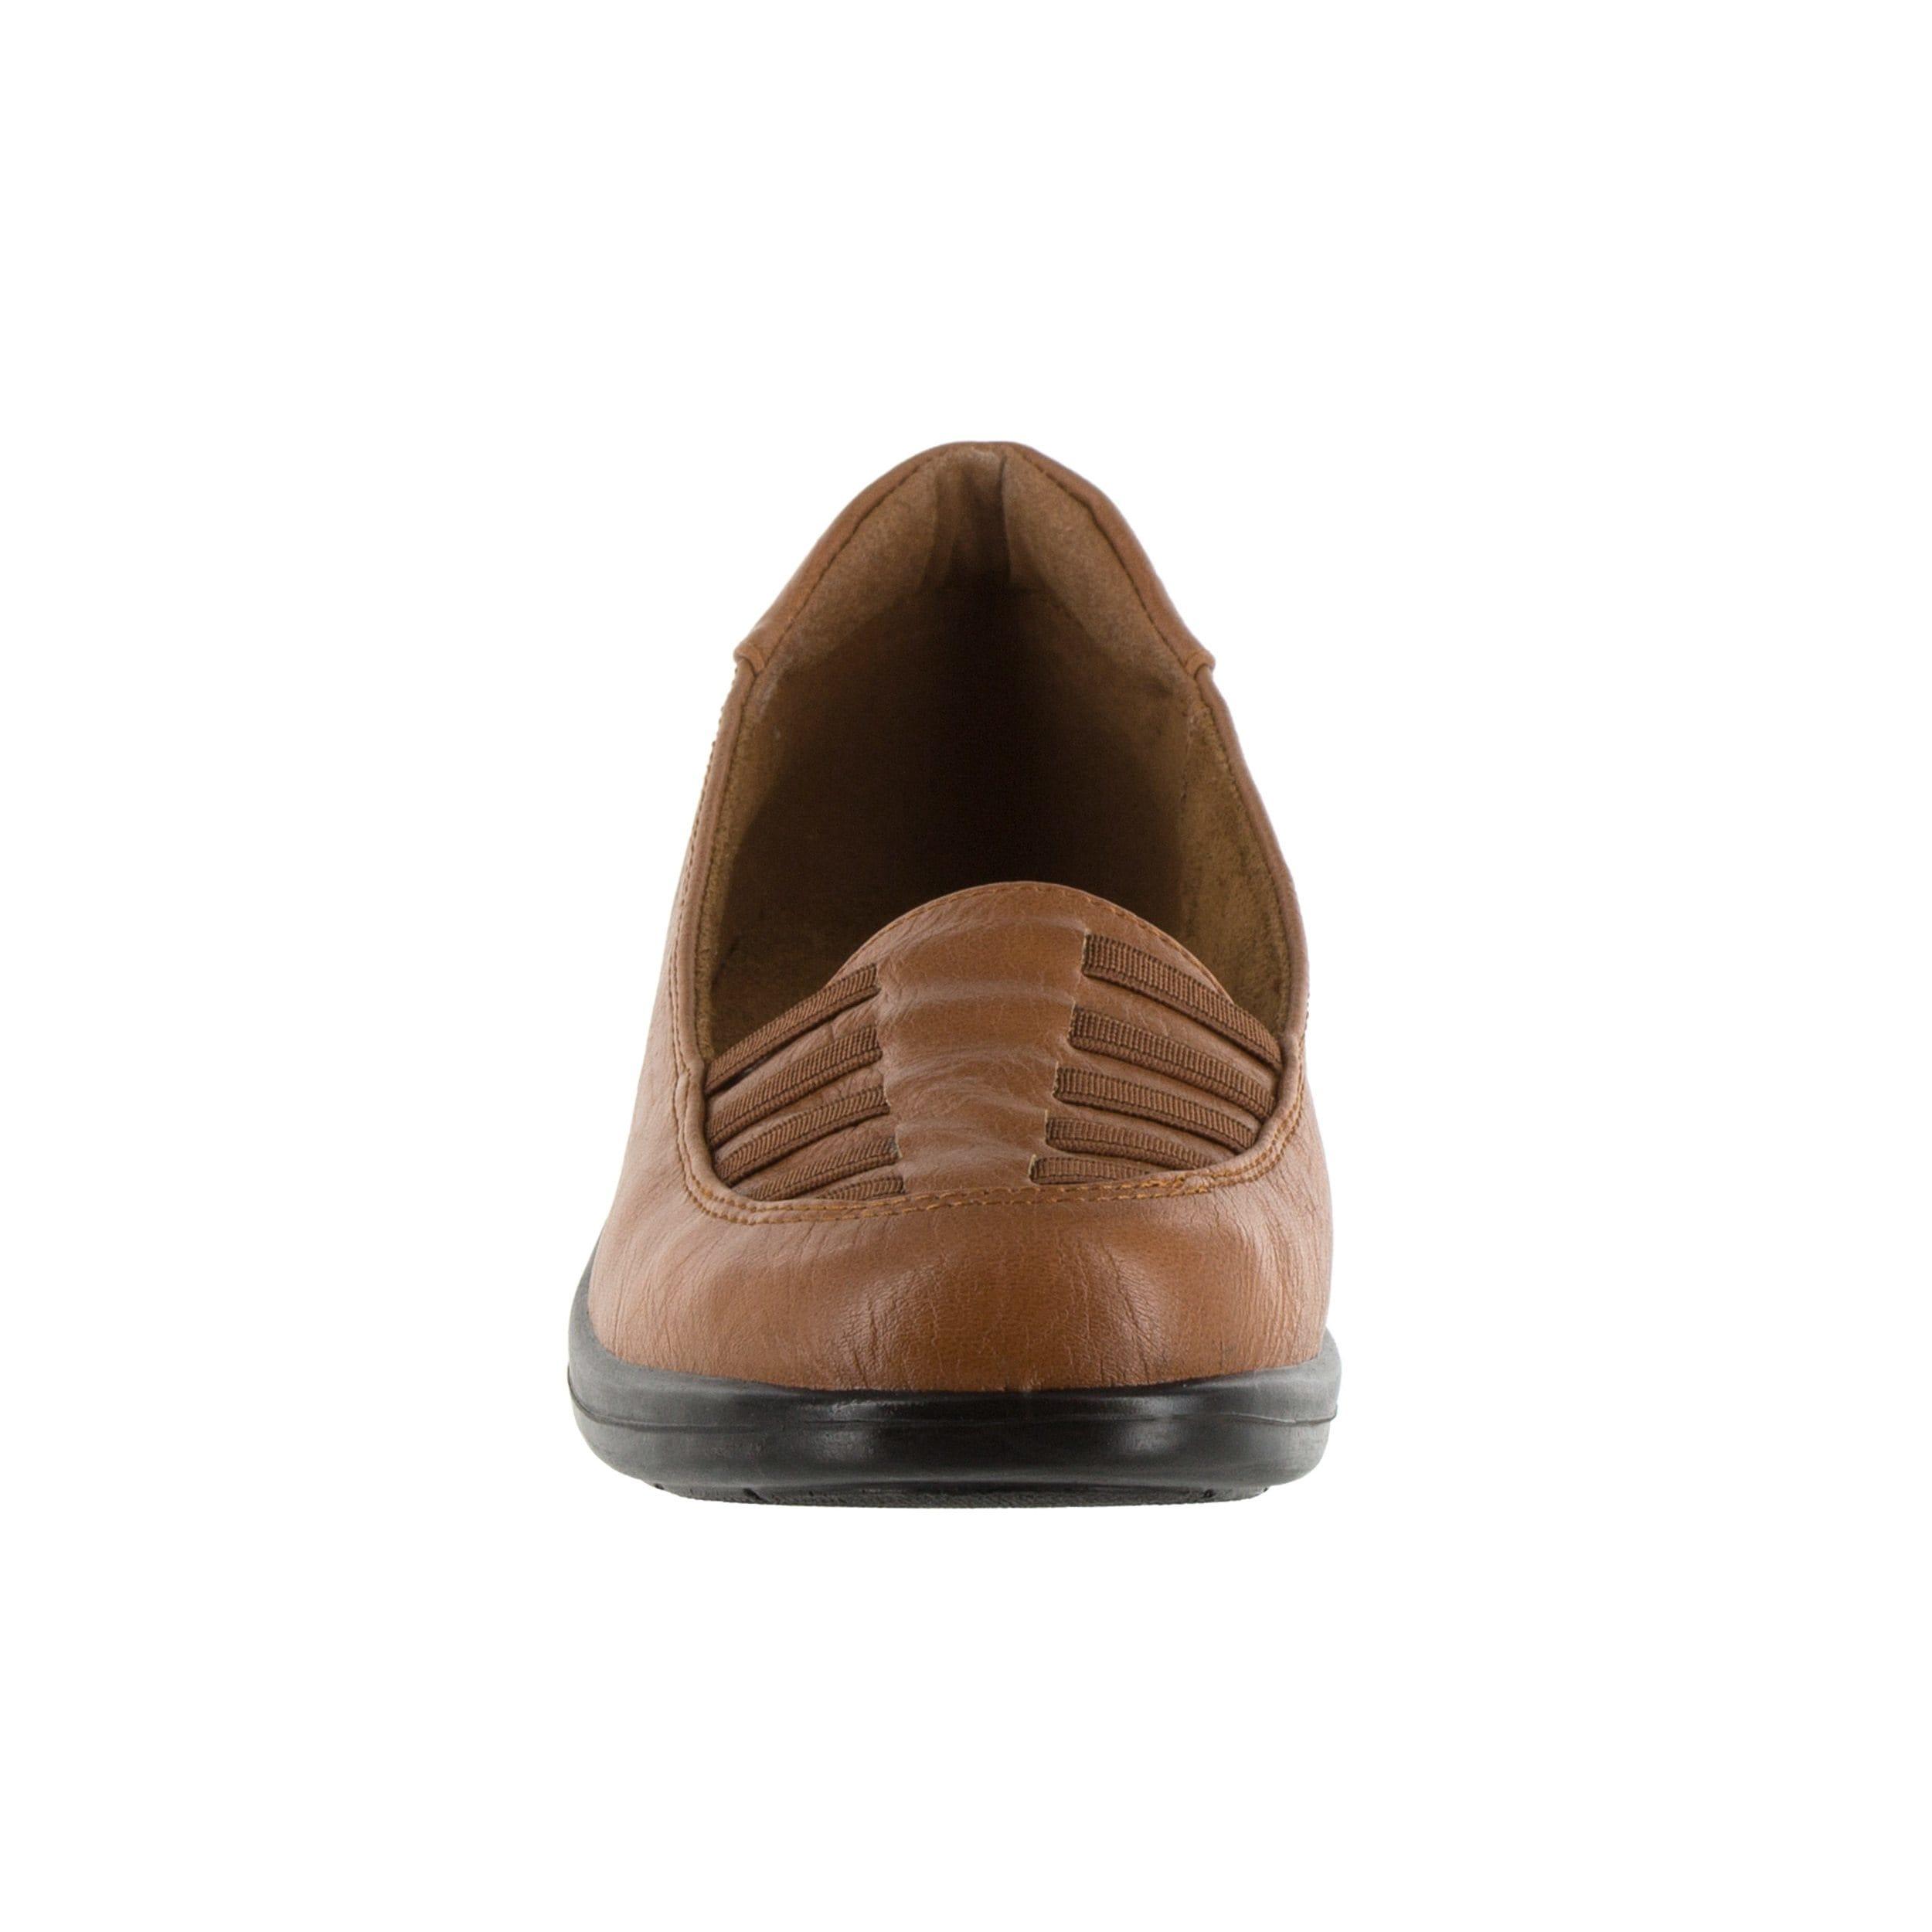 5c656136874 Shop Easy Street Women s Genesis Comfort Slip On (Tobacco) - Free Shipping  Today - Overstock - 16817293